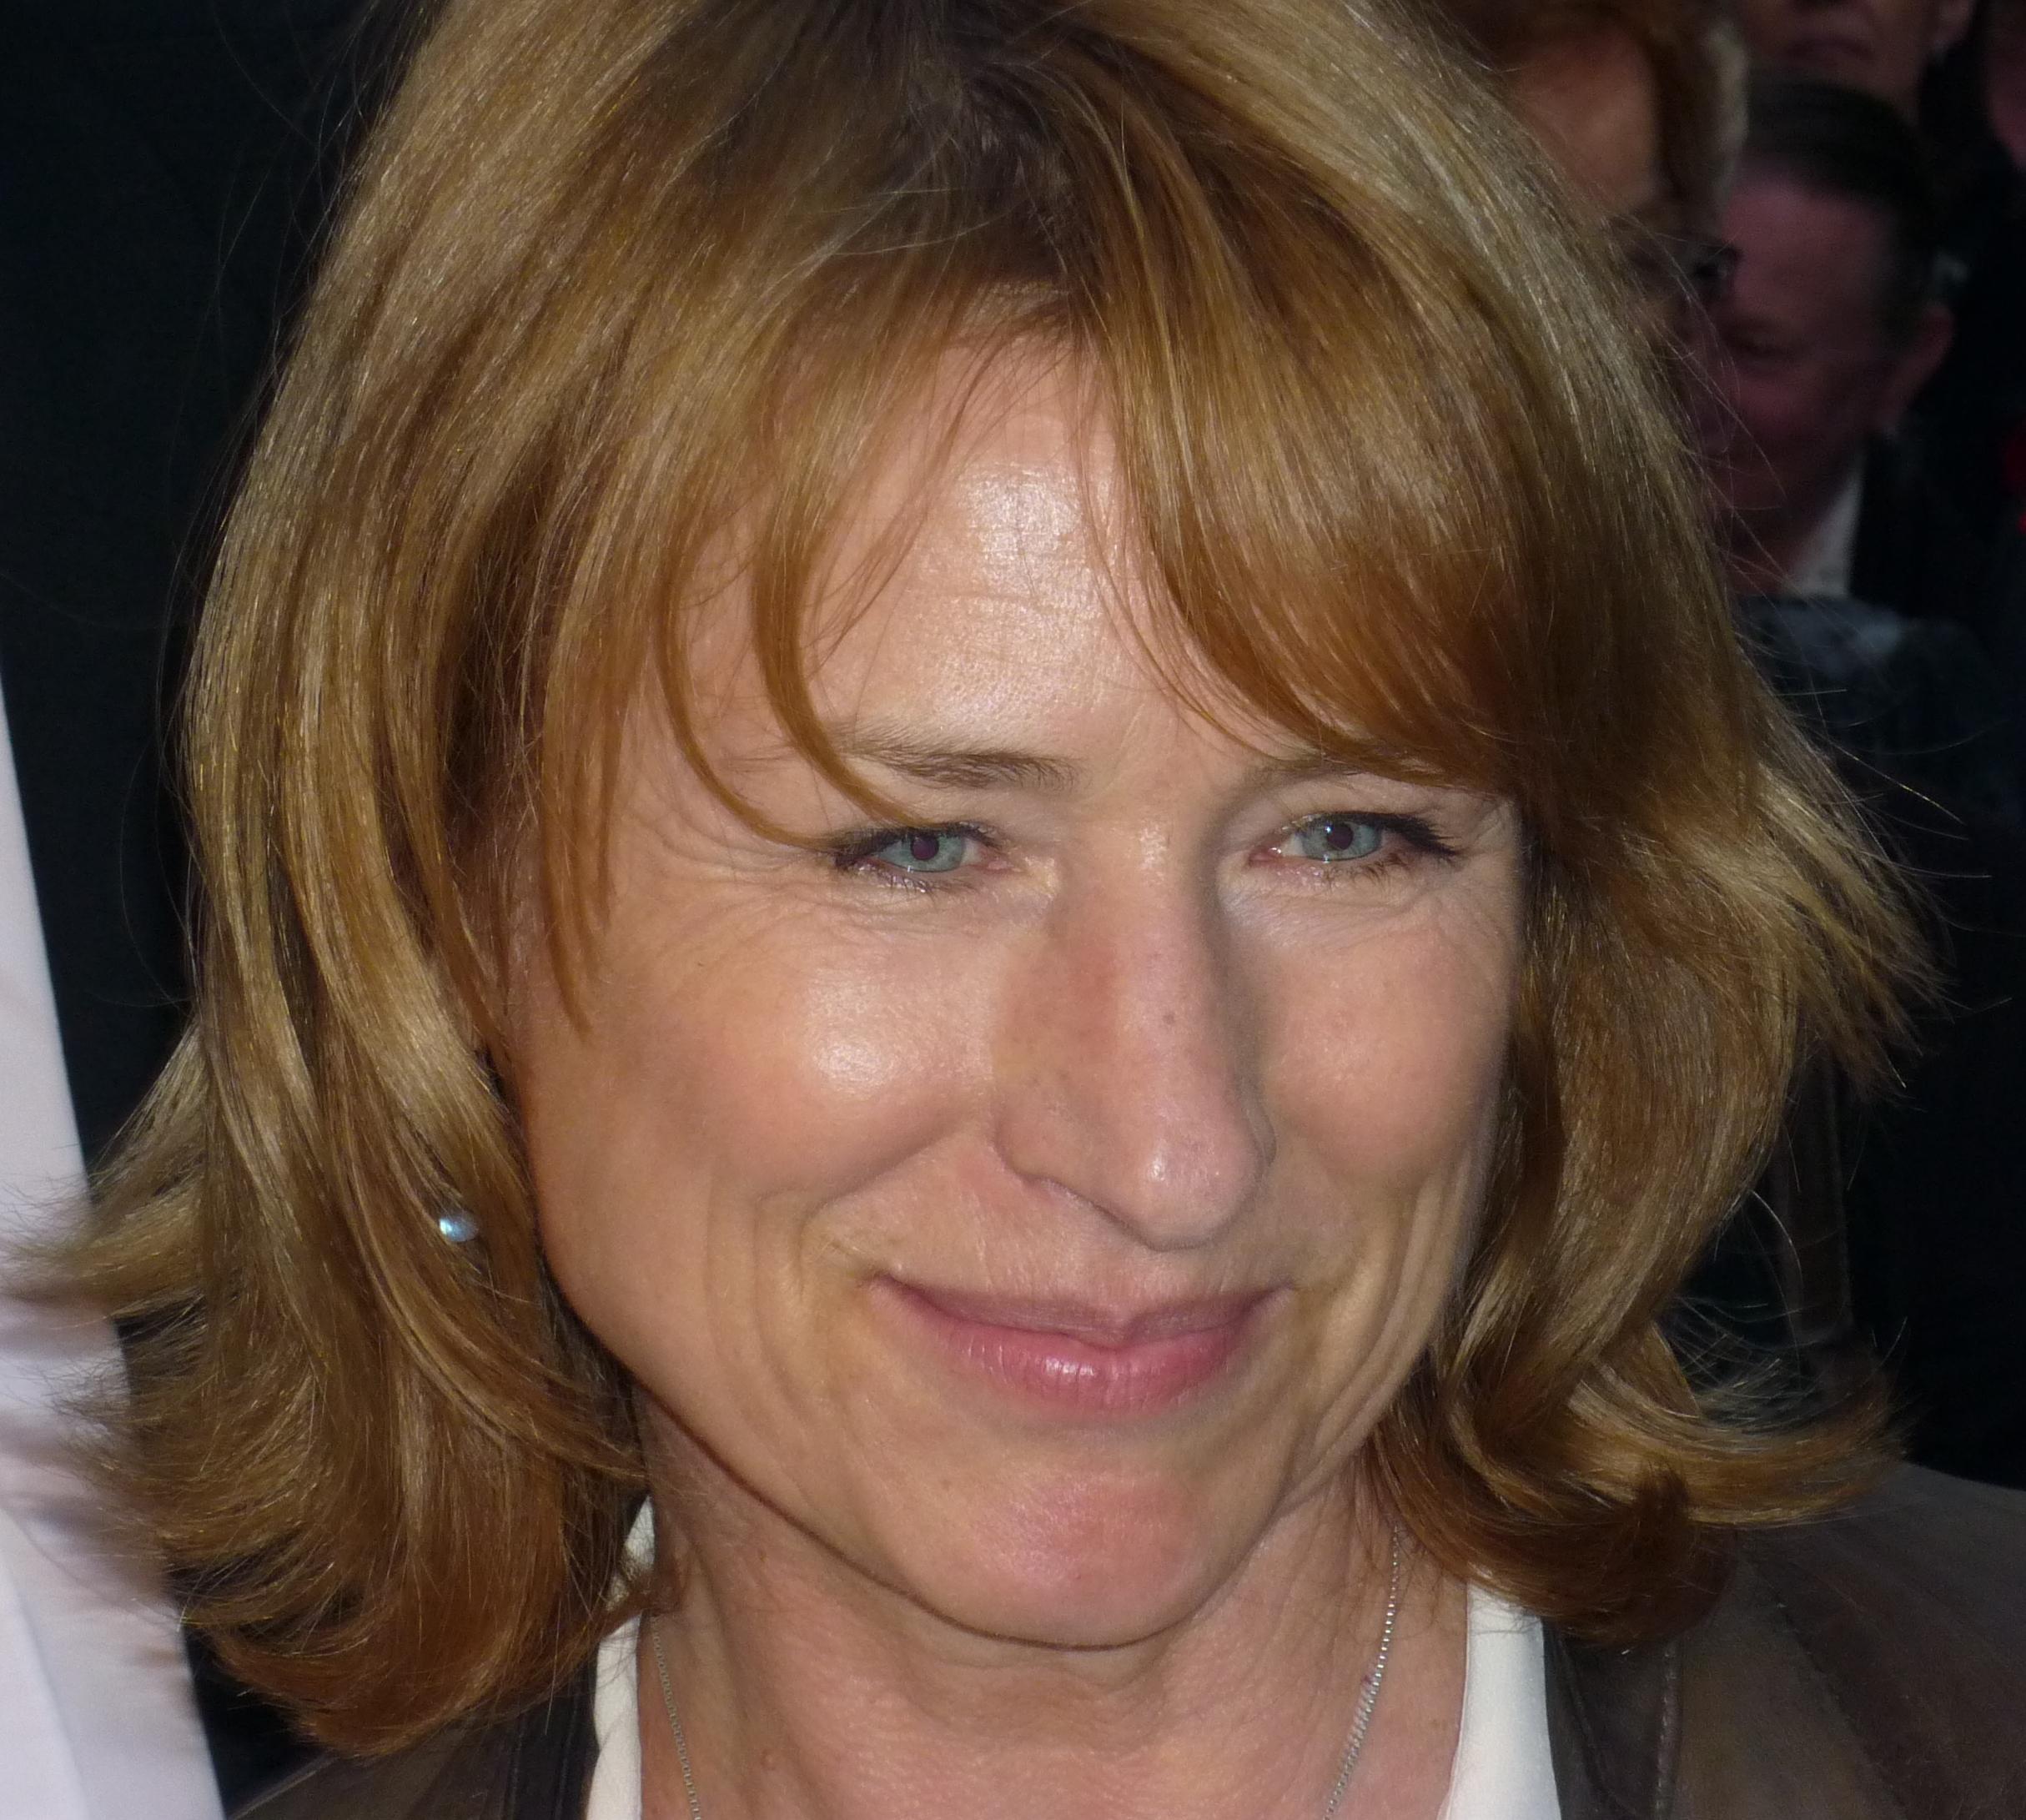 Tiedosto:Corinna Harfouch.JPG - Wikipedia